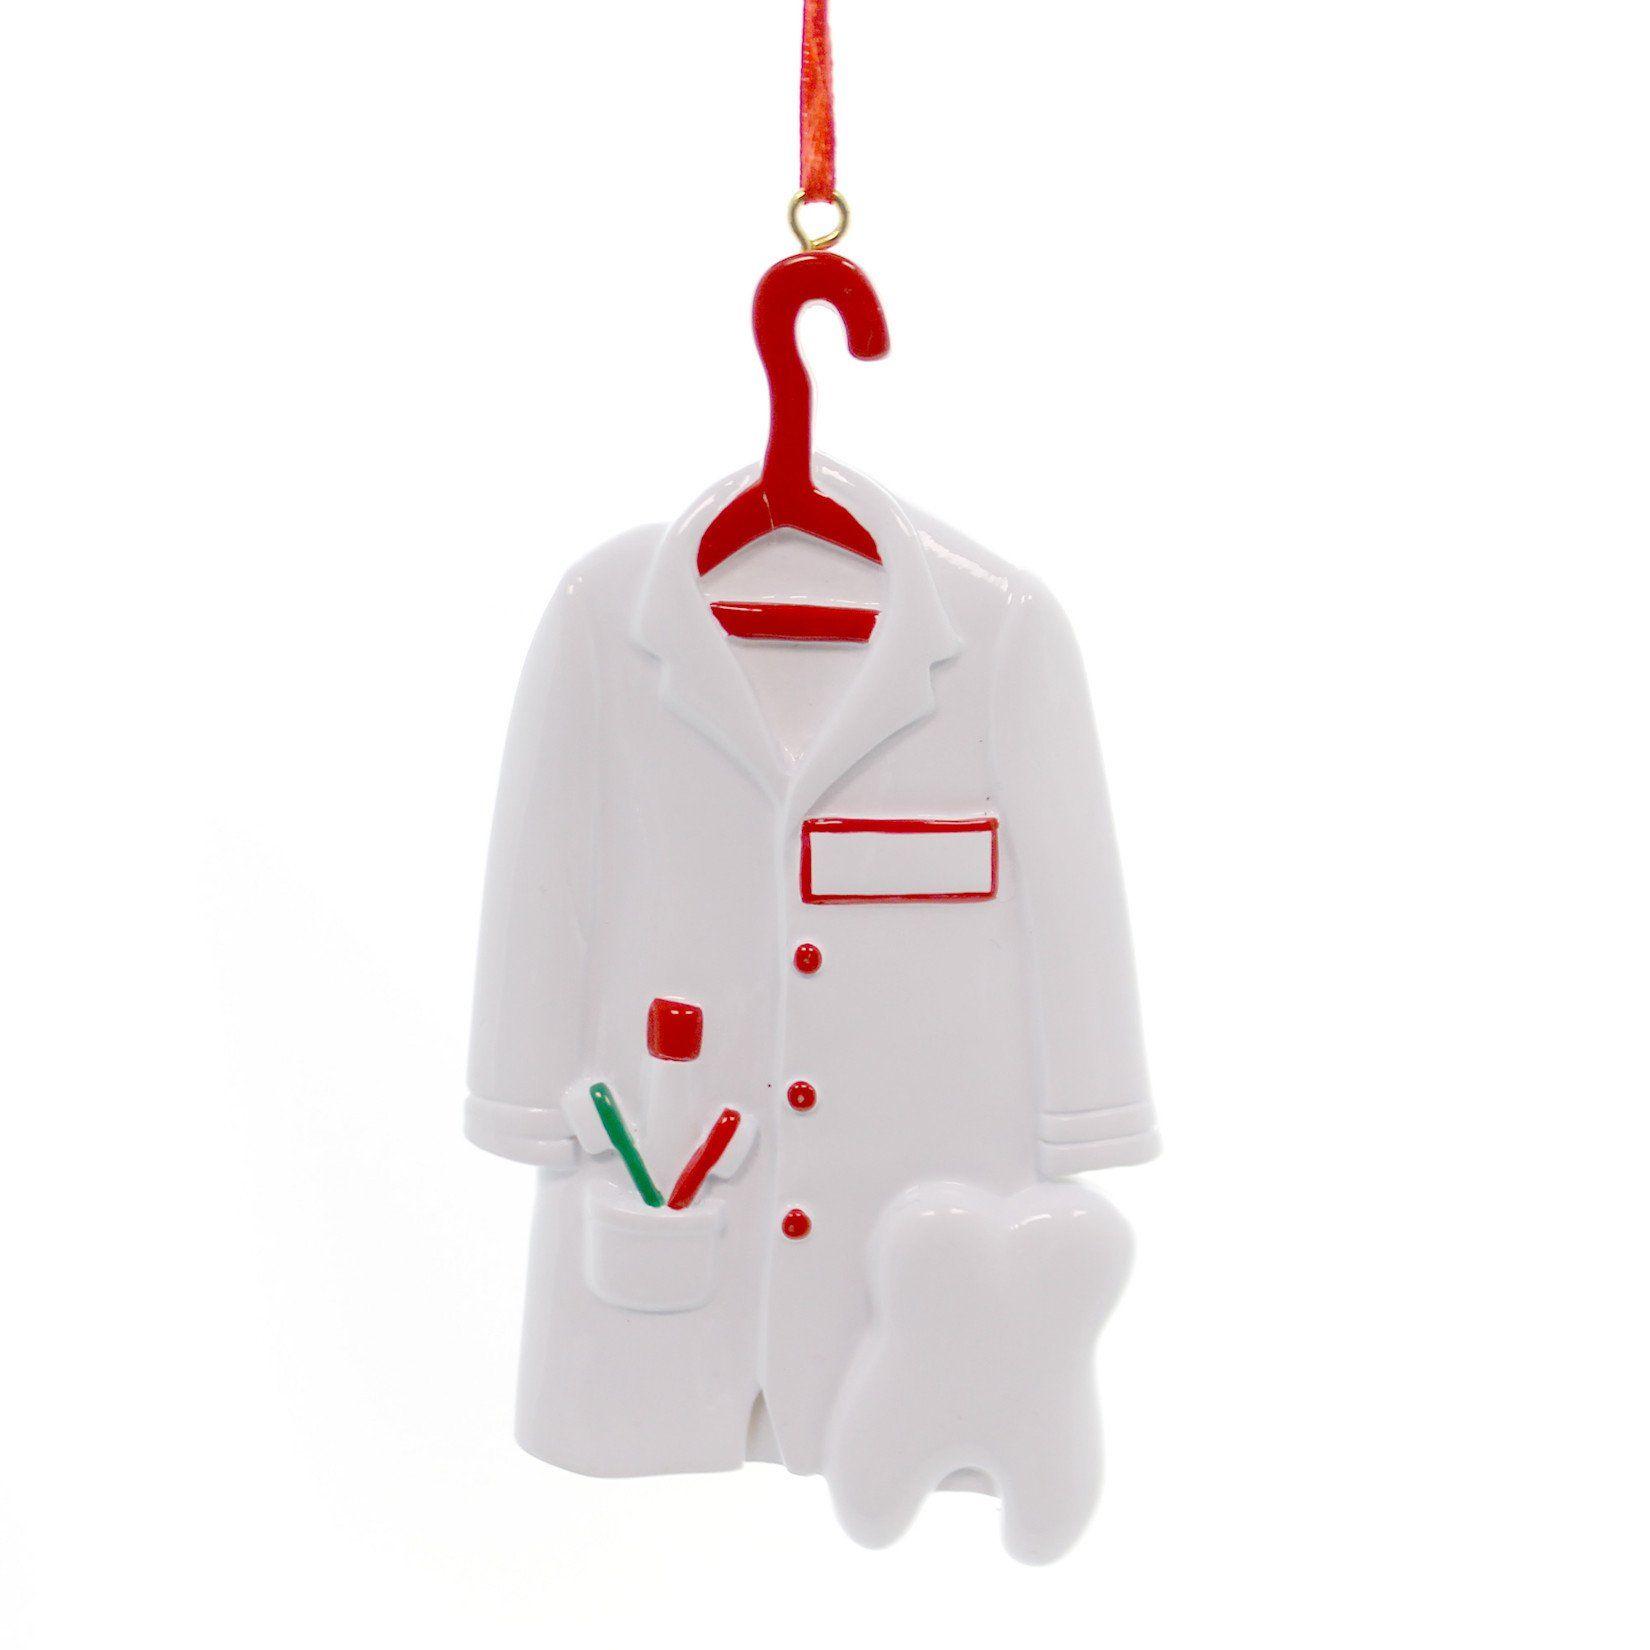 Personalized Ornament Dentist Coat Ornament Personalized Ornament